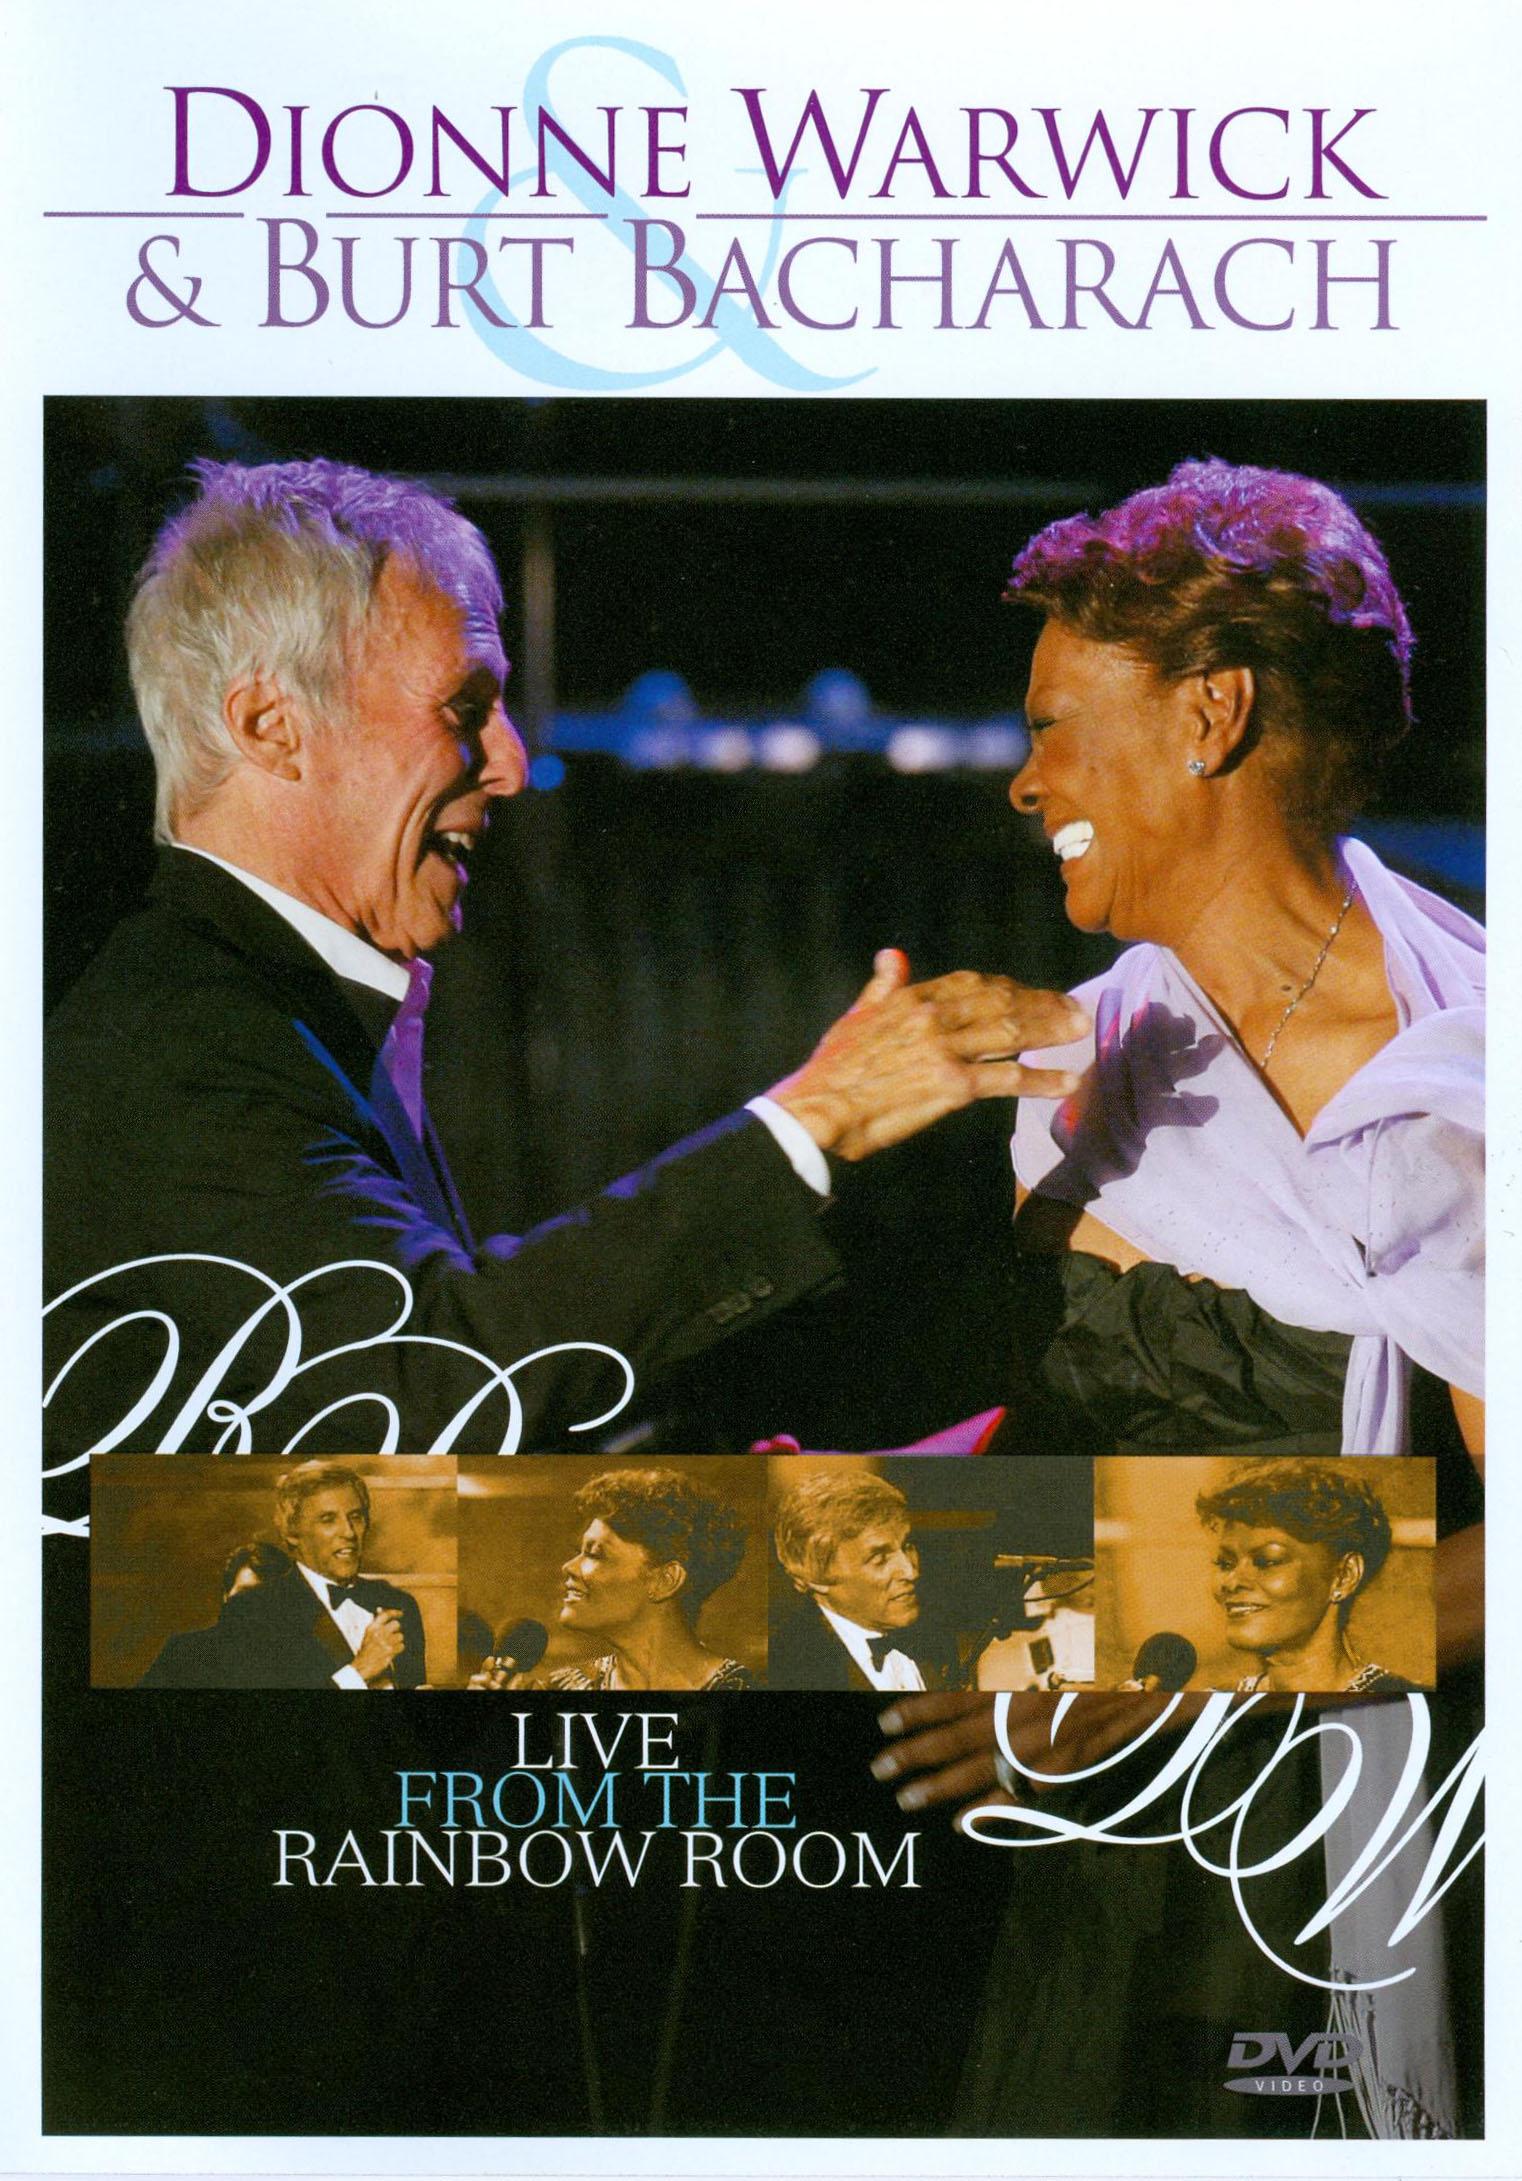 Dionne Warwick & Burt Bacharach: Live From The Rainbow Room